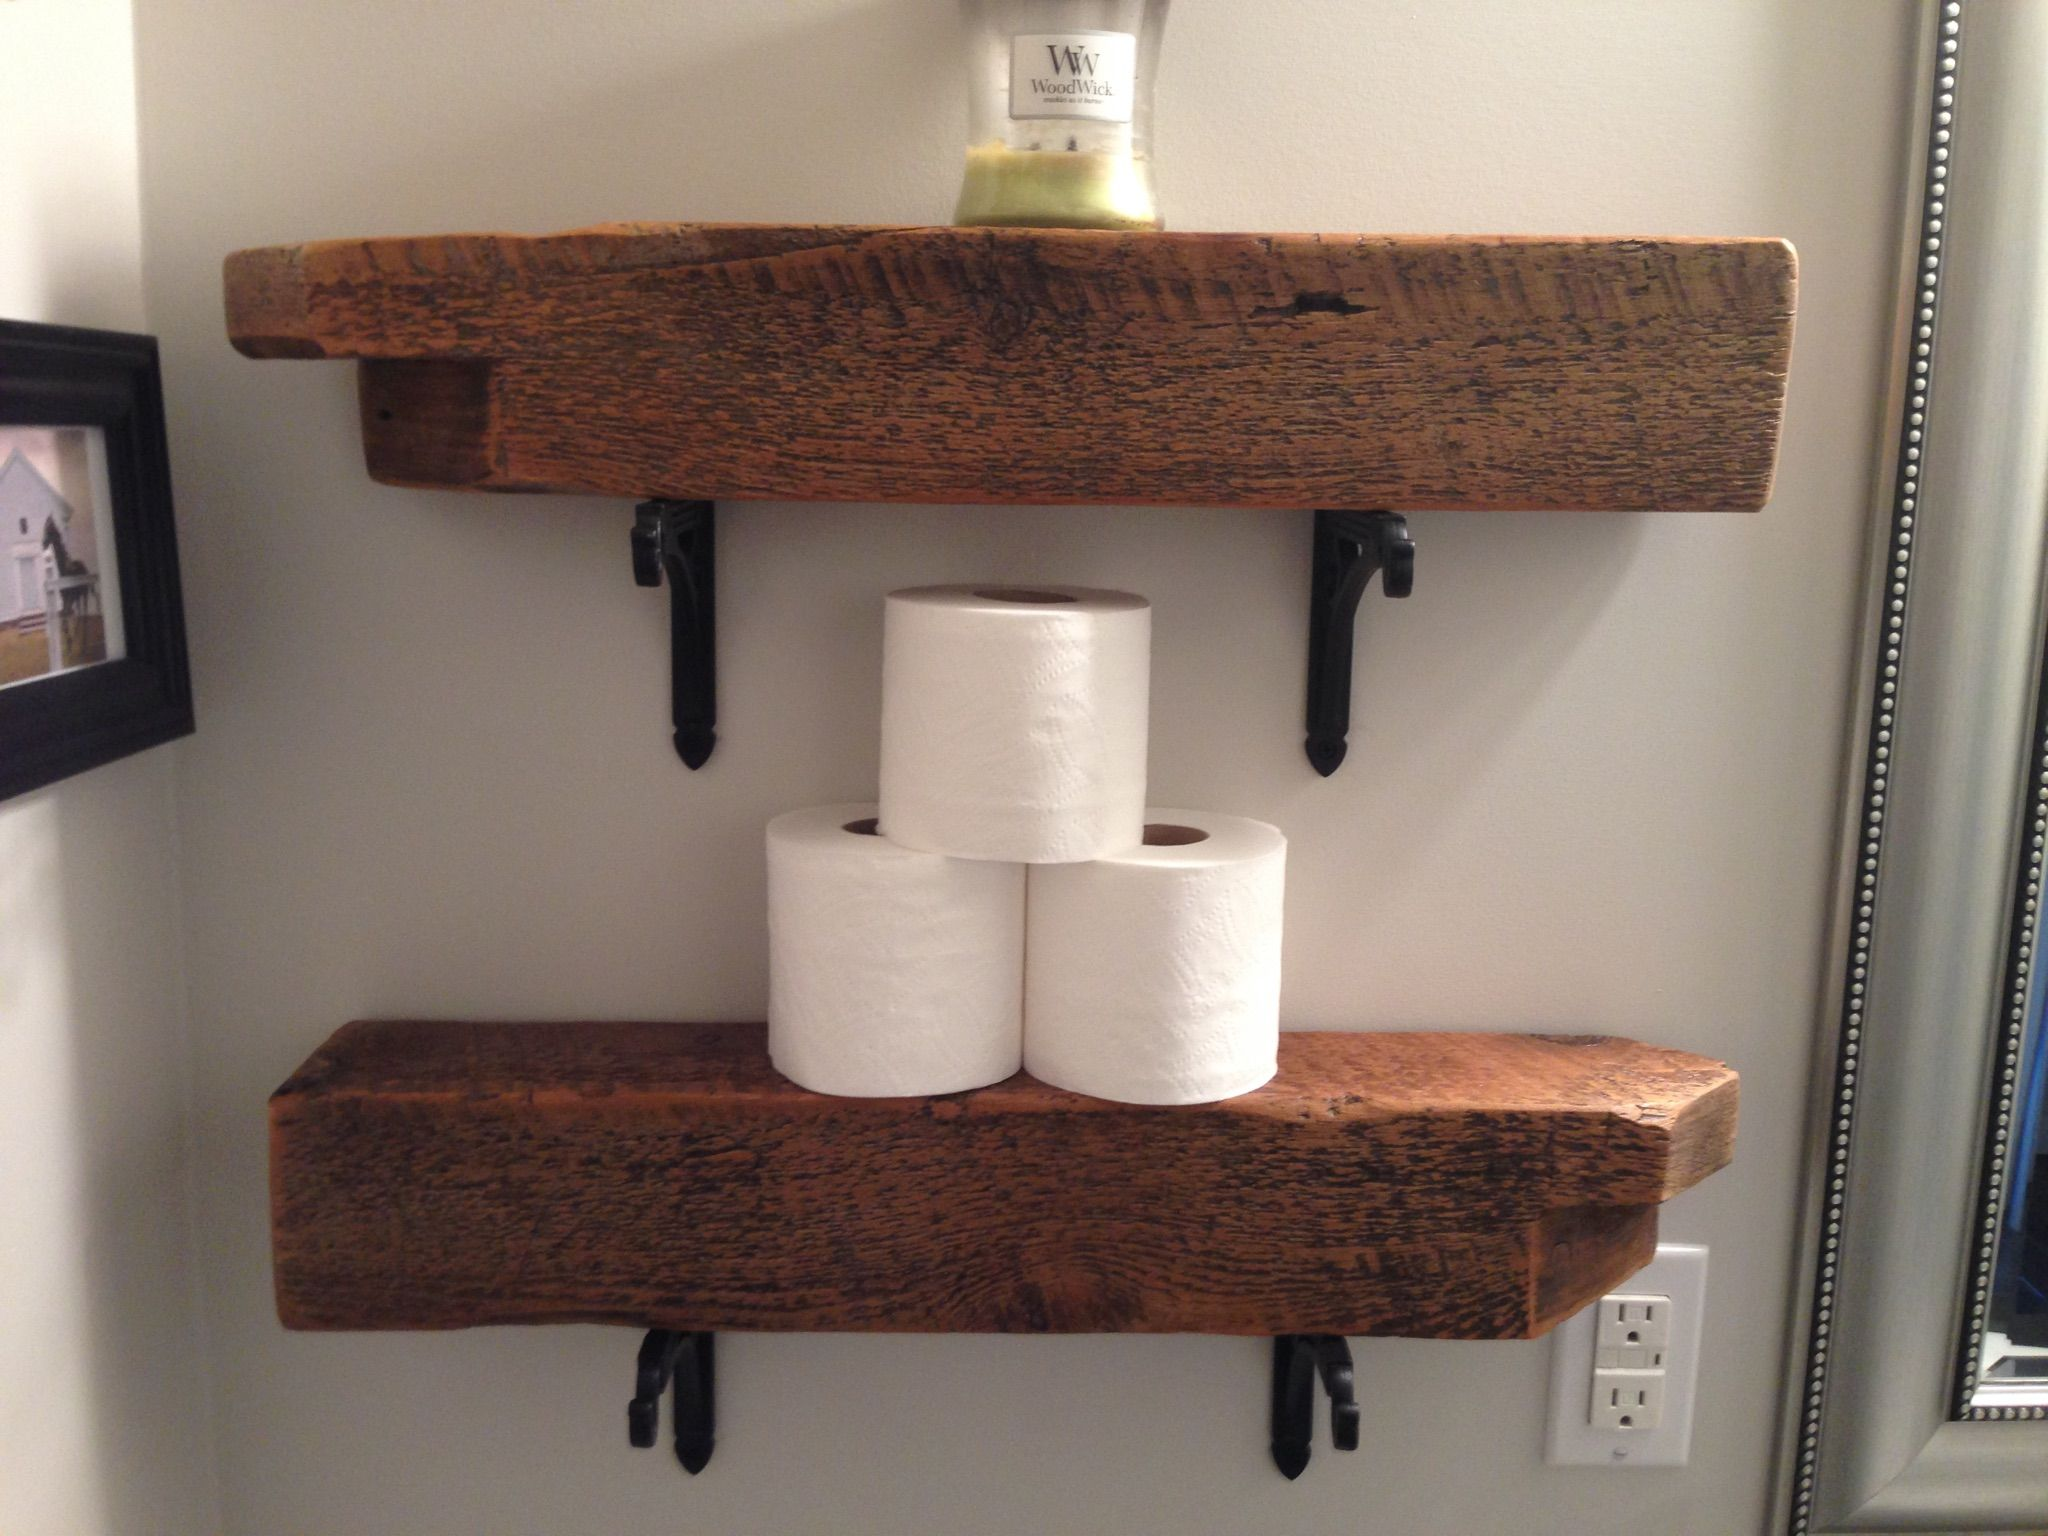 Small Shelves Made Using Barnboardstore Com Reclaimed 4x4 Barn Beam Wind Braces Barn Board Headboard Barn Beams Barn Board